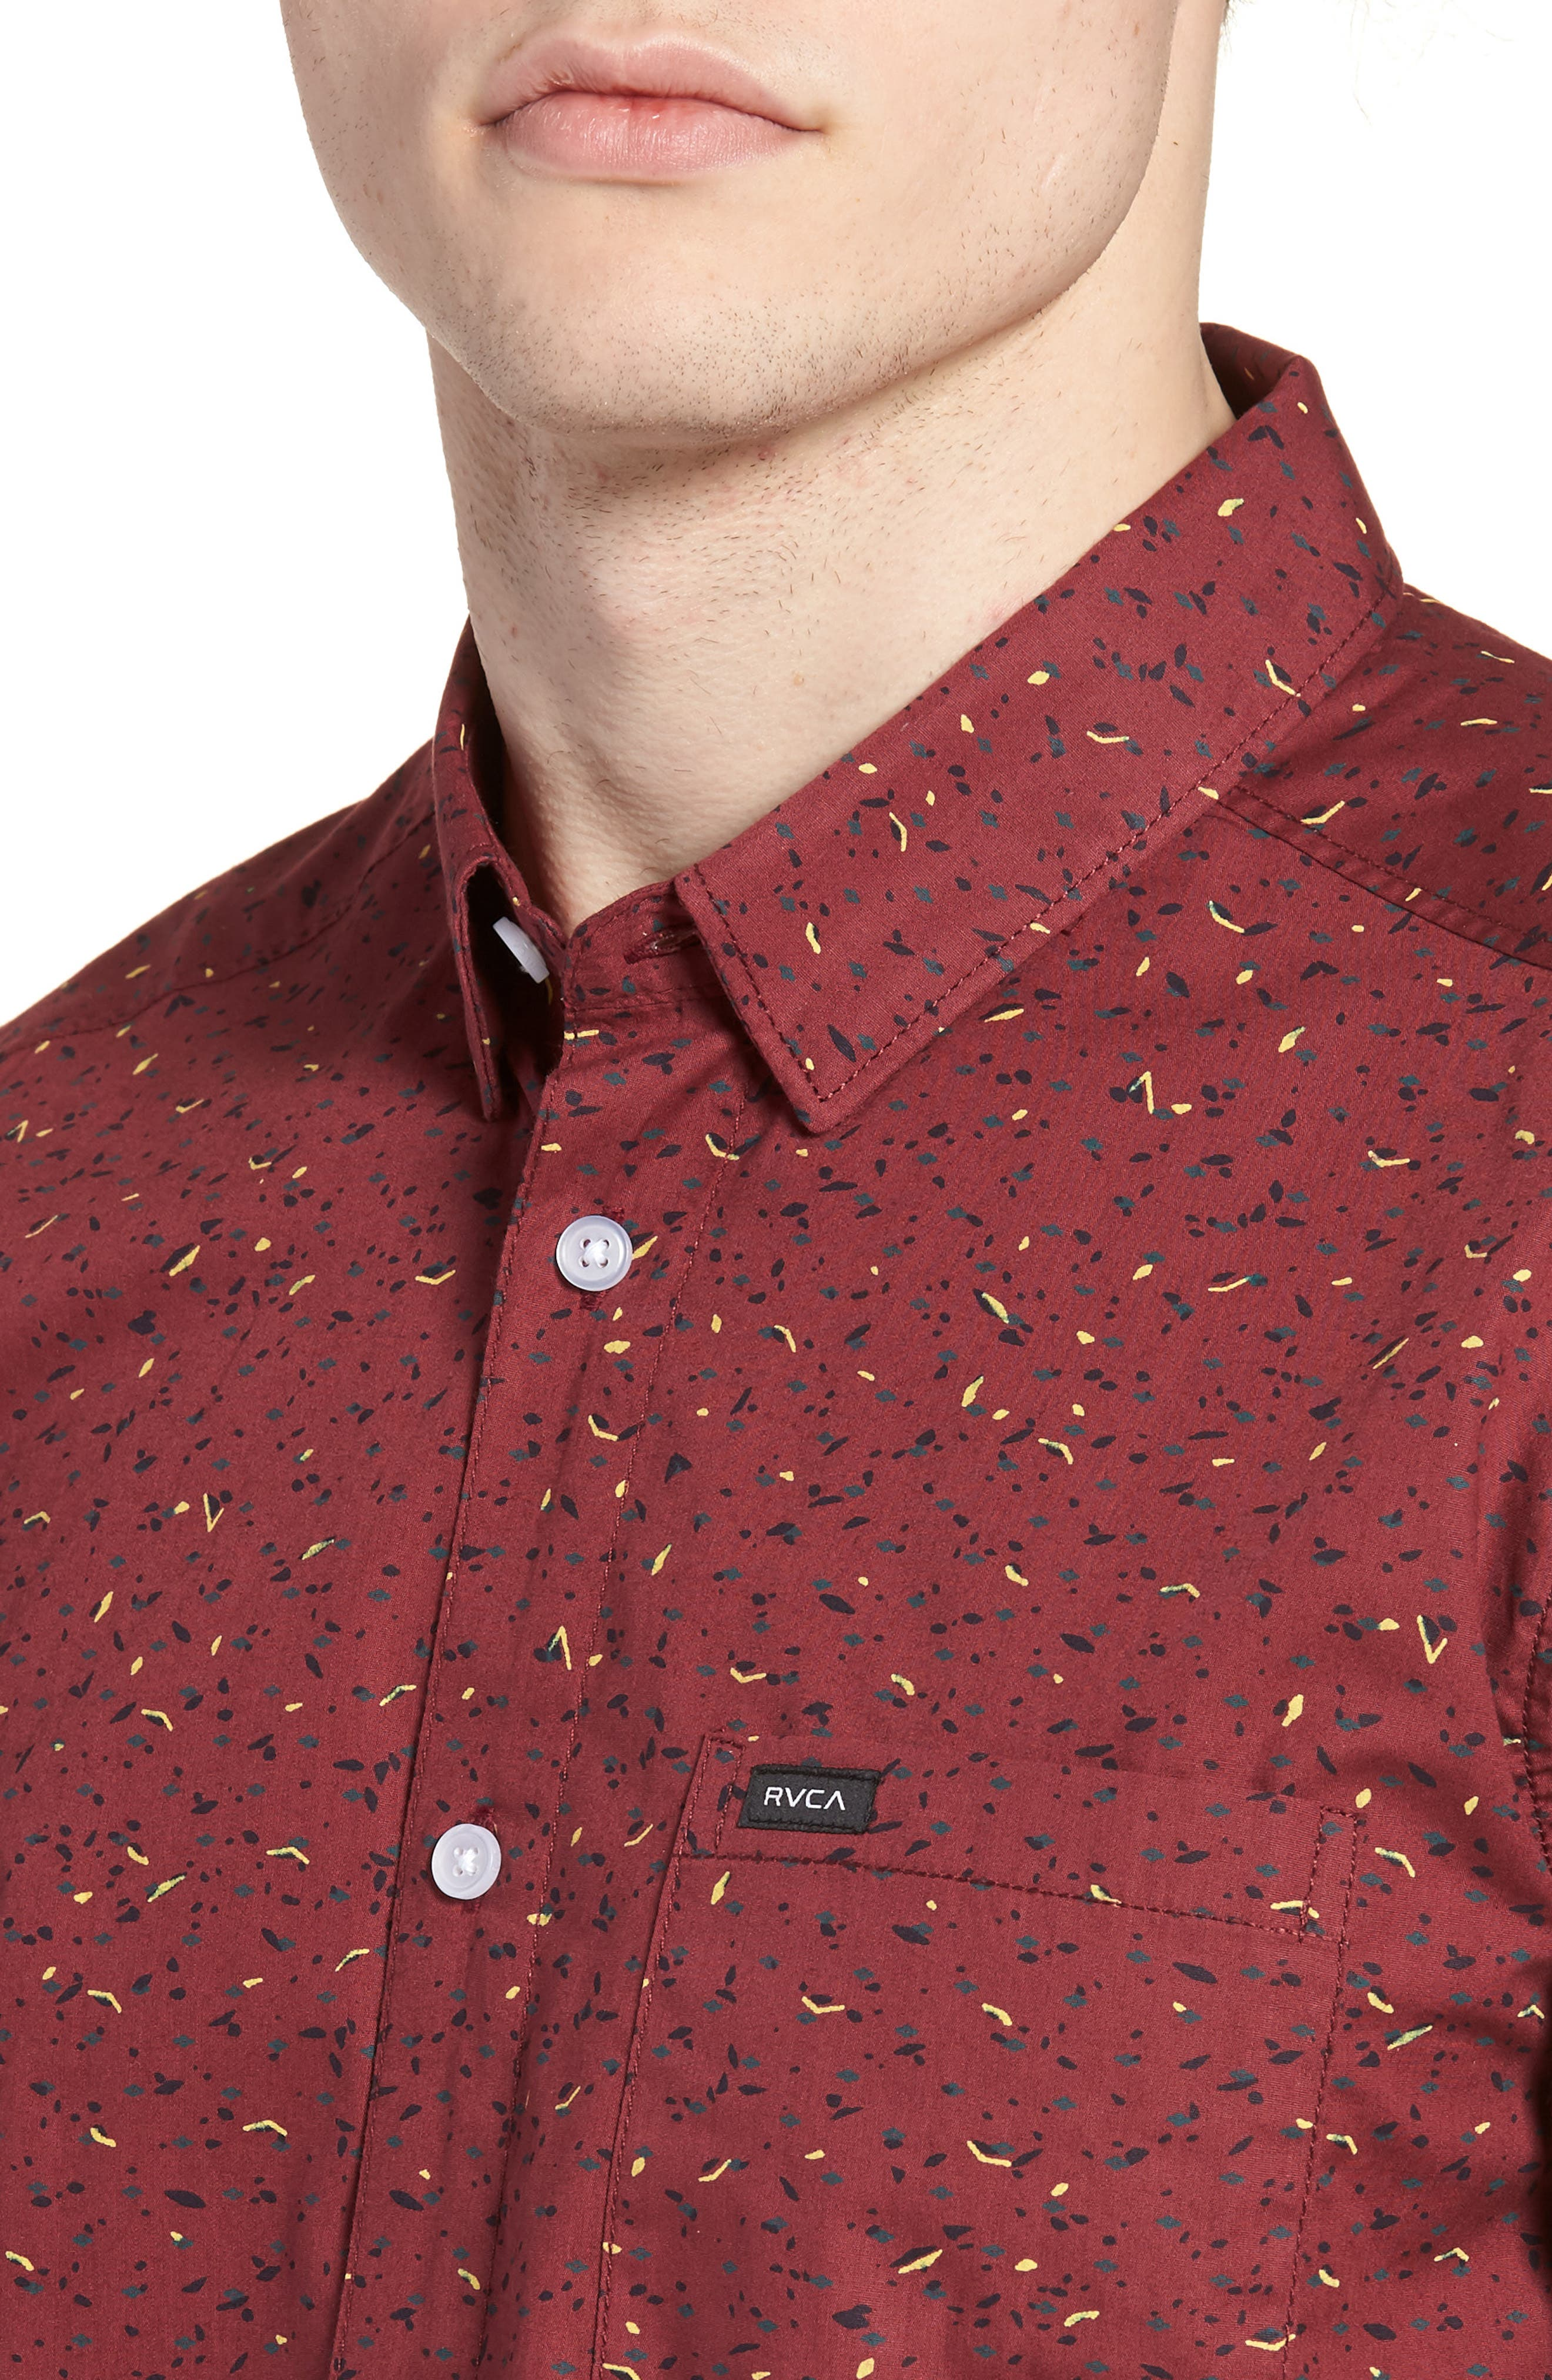 Jaded Woven Shirt,                             Alternate thumbnail 2, color,                             Tawny Port